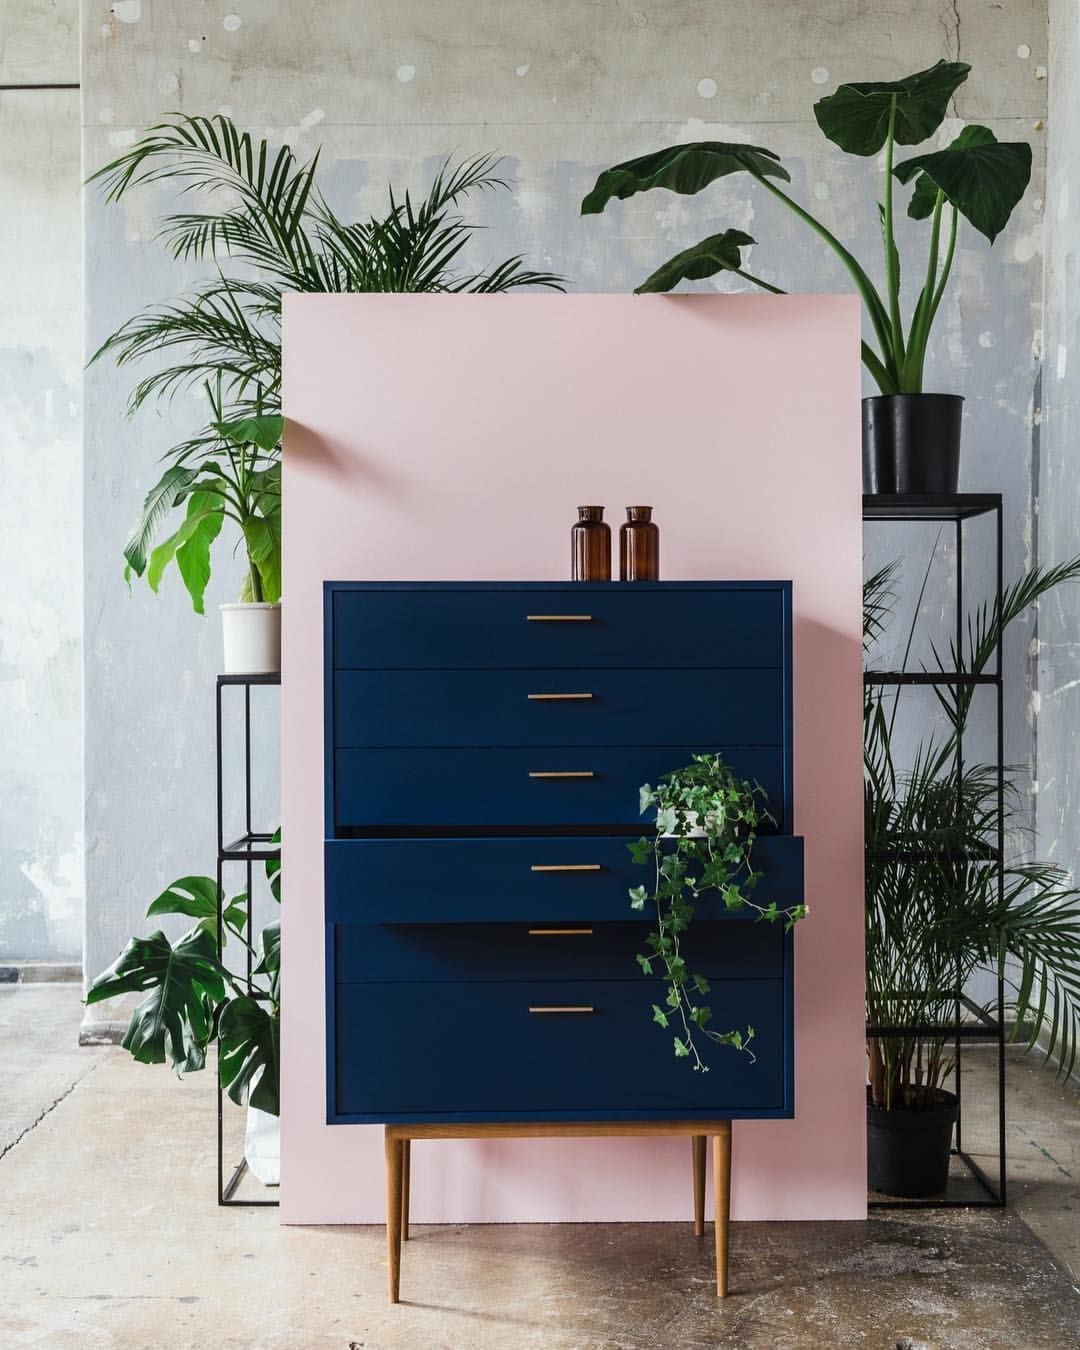 Pink wall with dark blue dresser home decor inspiration home decor